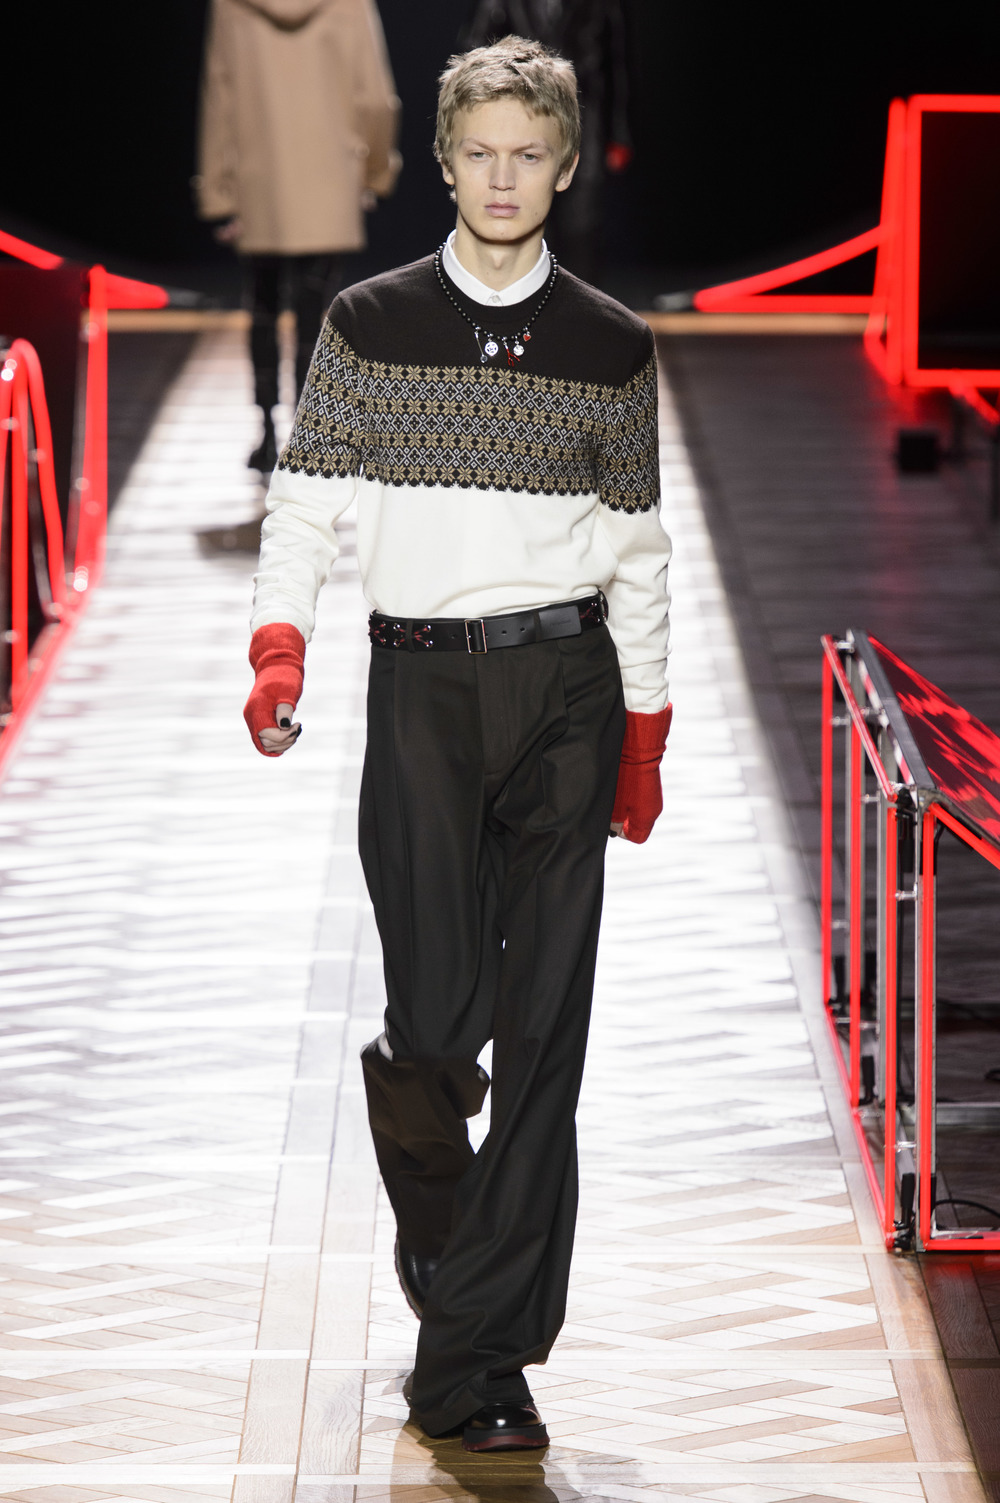 Dior_Homme_Hiver2016-17_look_31.JPG